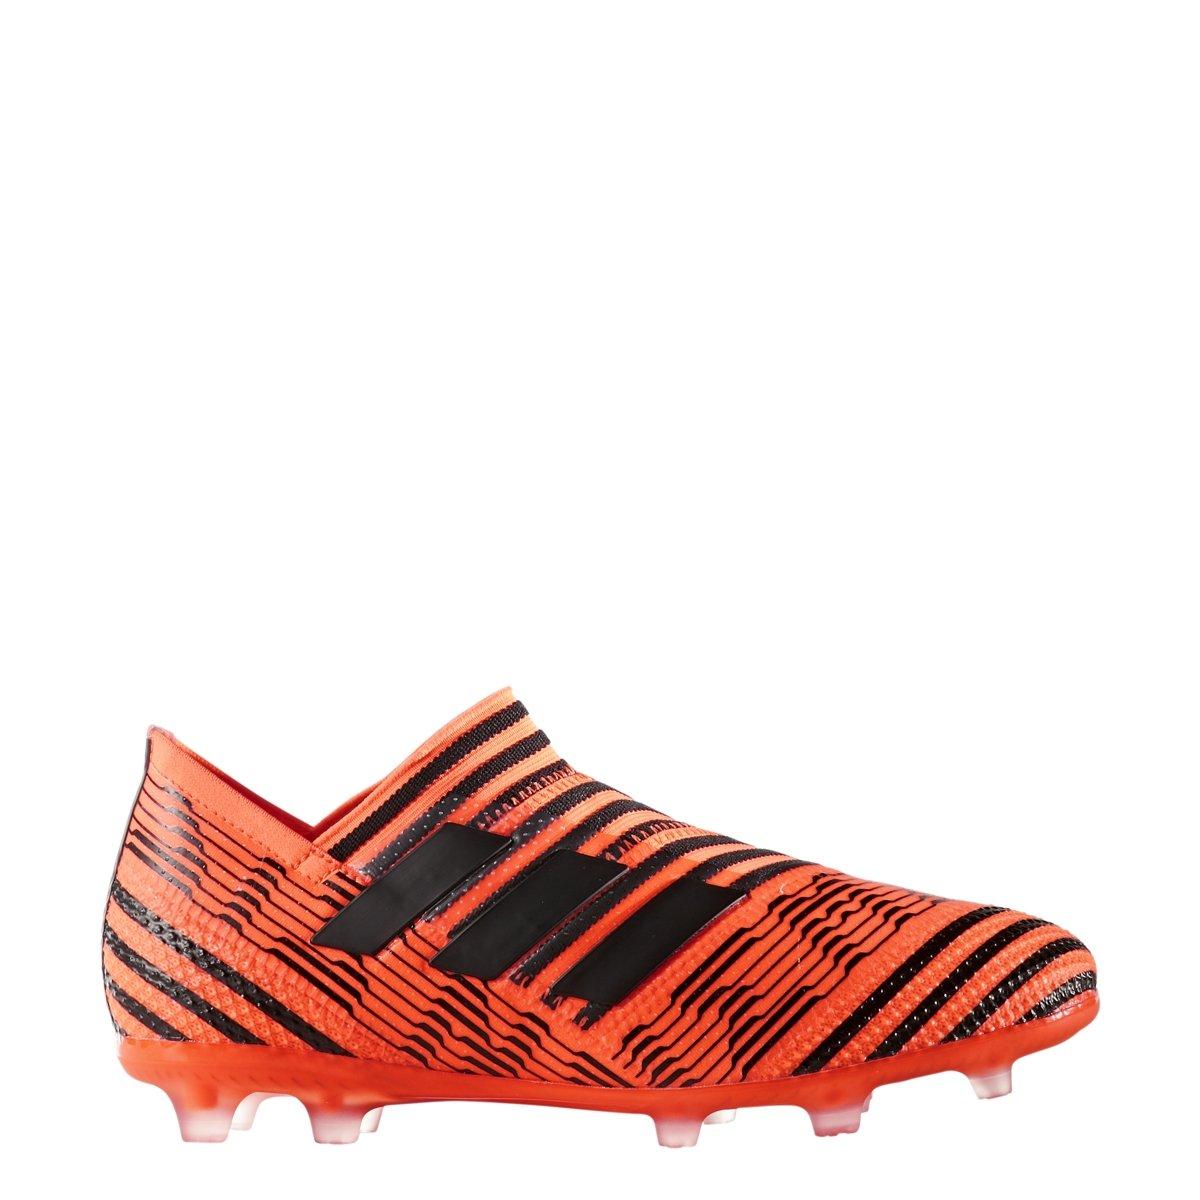 adidas Nemeziz 17+ 360 Agility FG Soccer Cleats - Solar Orange-Core Black-Solar Red - Boys - 5.5